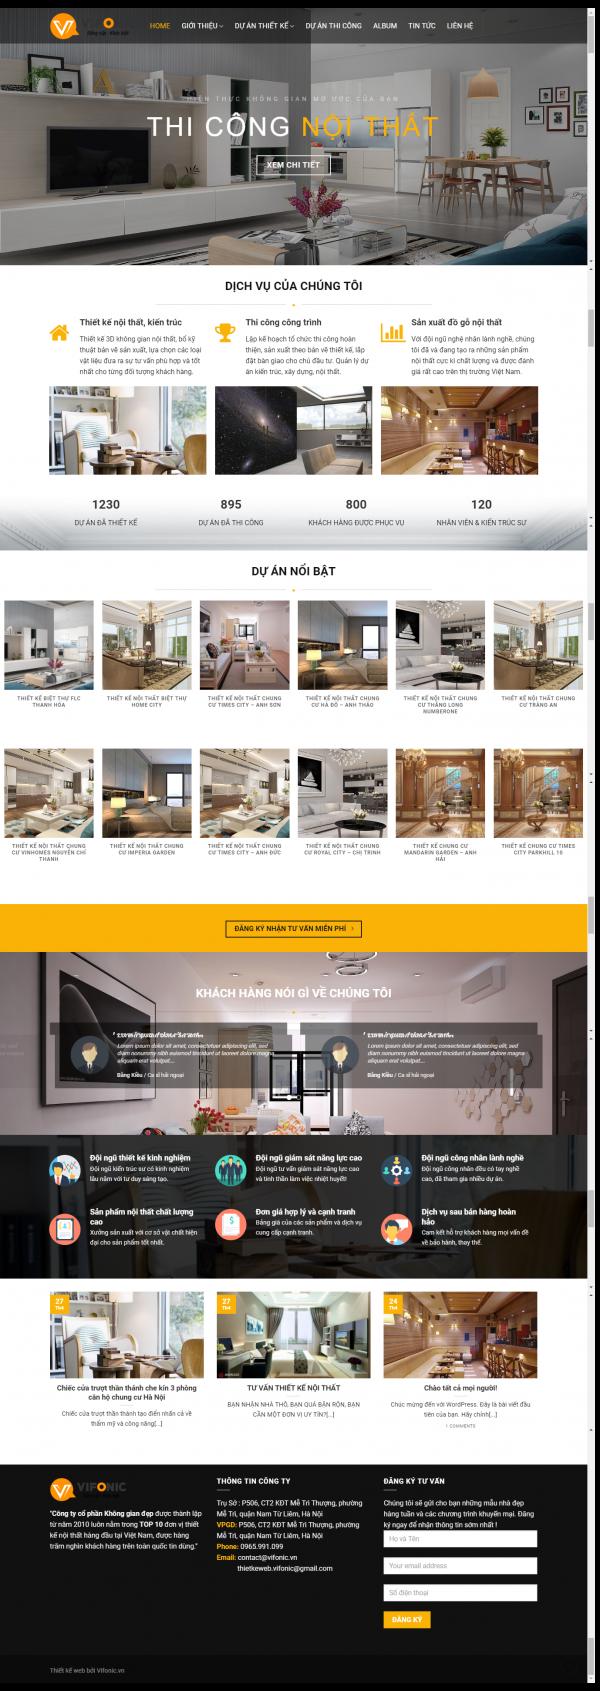 Thiết kế web nội thất mẫu 12